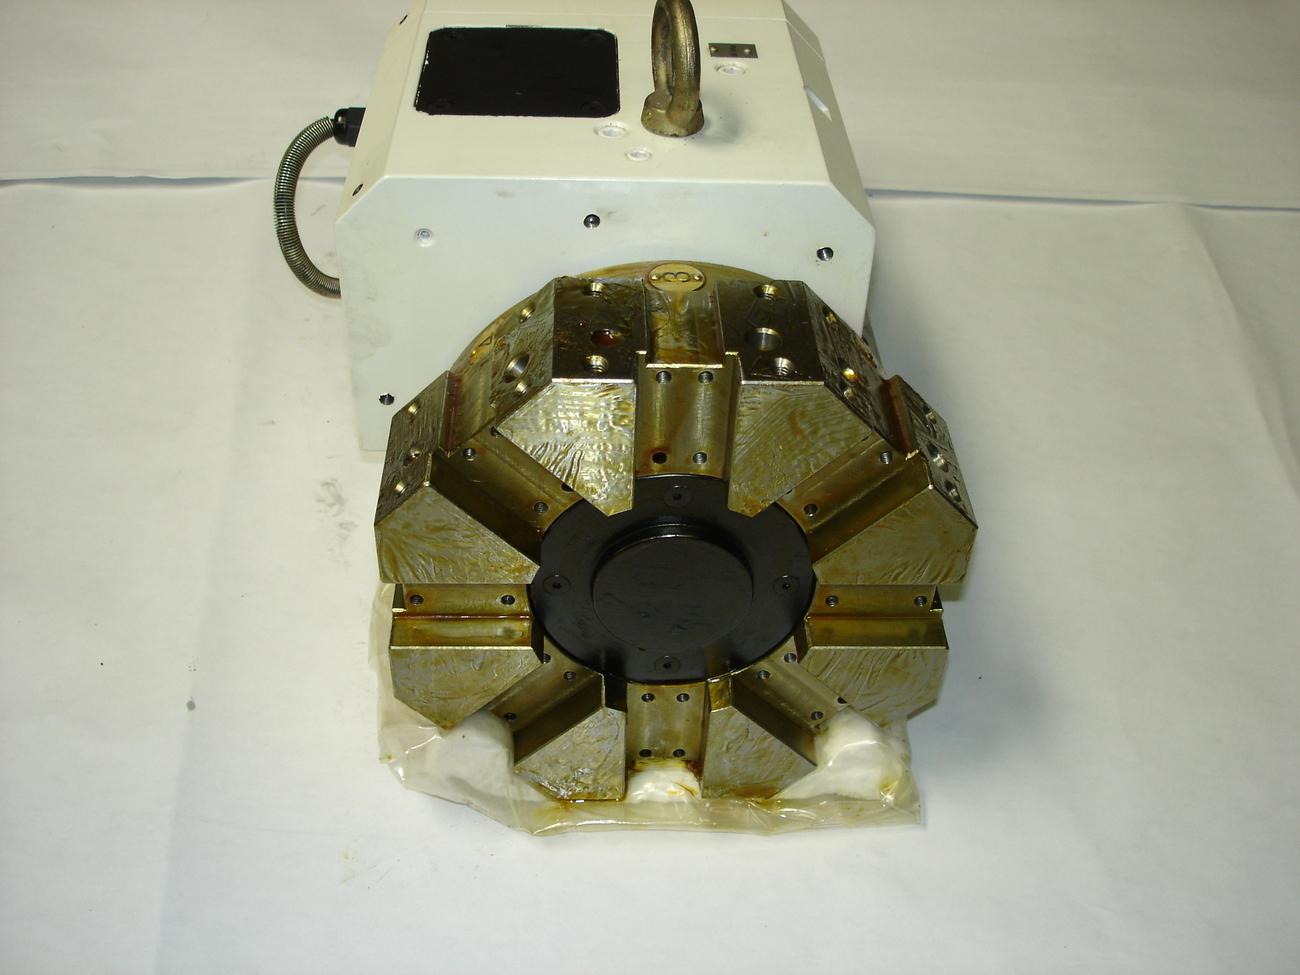 Golden Sun CLT-63-8T Turret